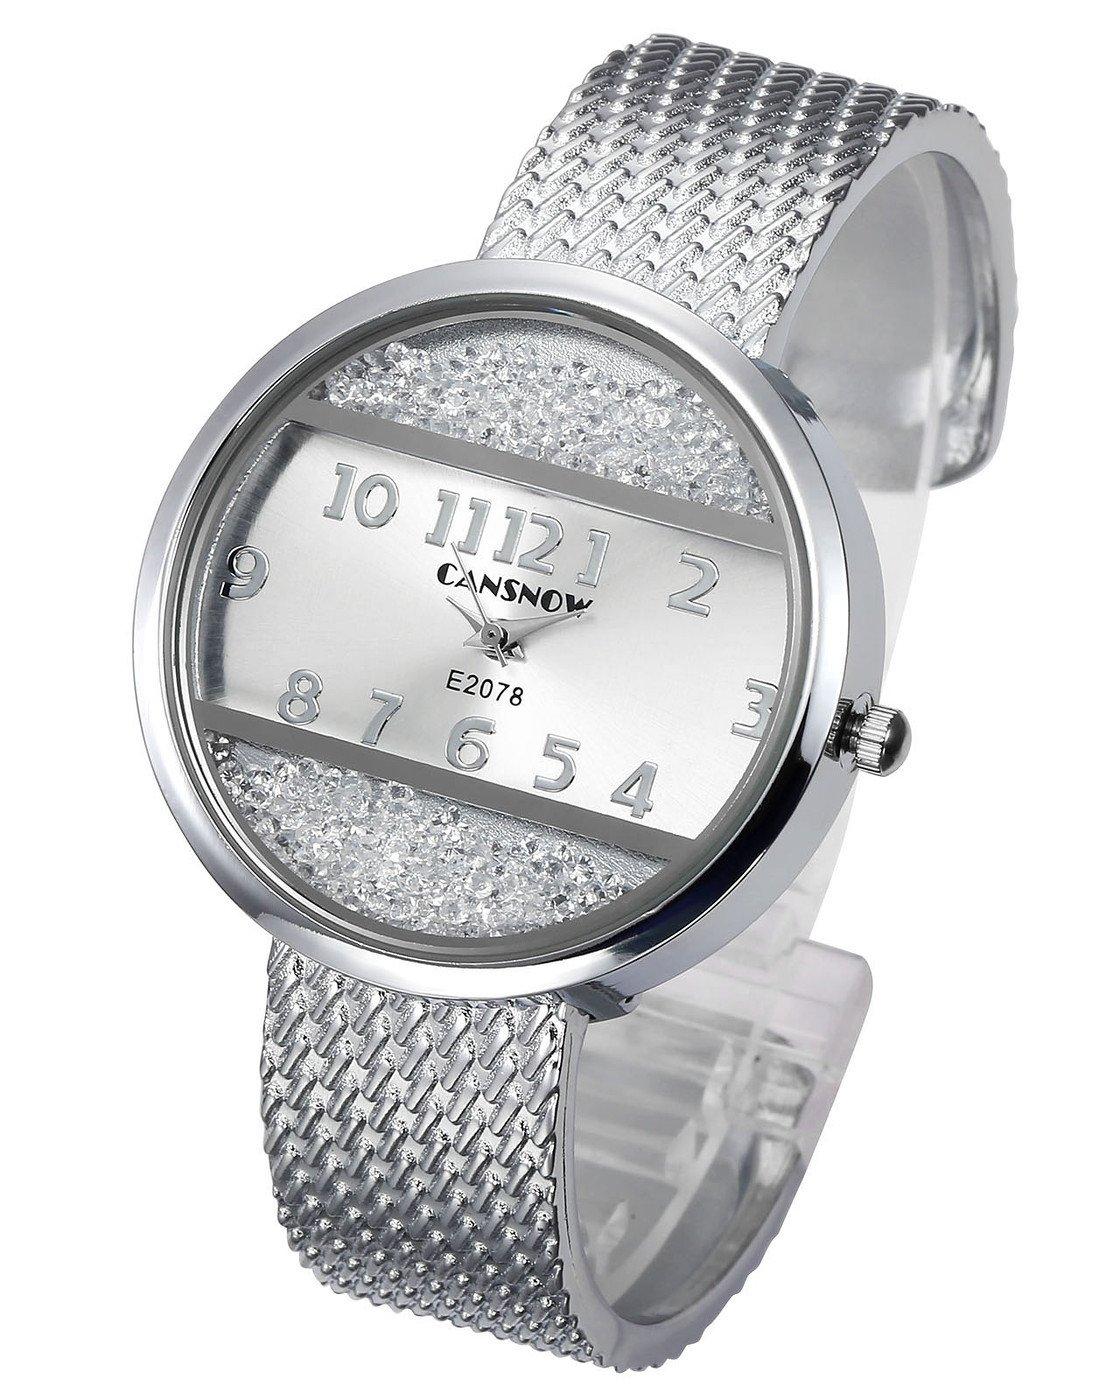 Top Plaza Women Ladies Casual Luxury Gold Silver Tone Alloy Analog Quartz Bracelet Watch Round Case Rectangle Dial Rhinestones Decorated Elegant Dress Bangle Cuff Wristwatch-Silver #2